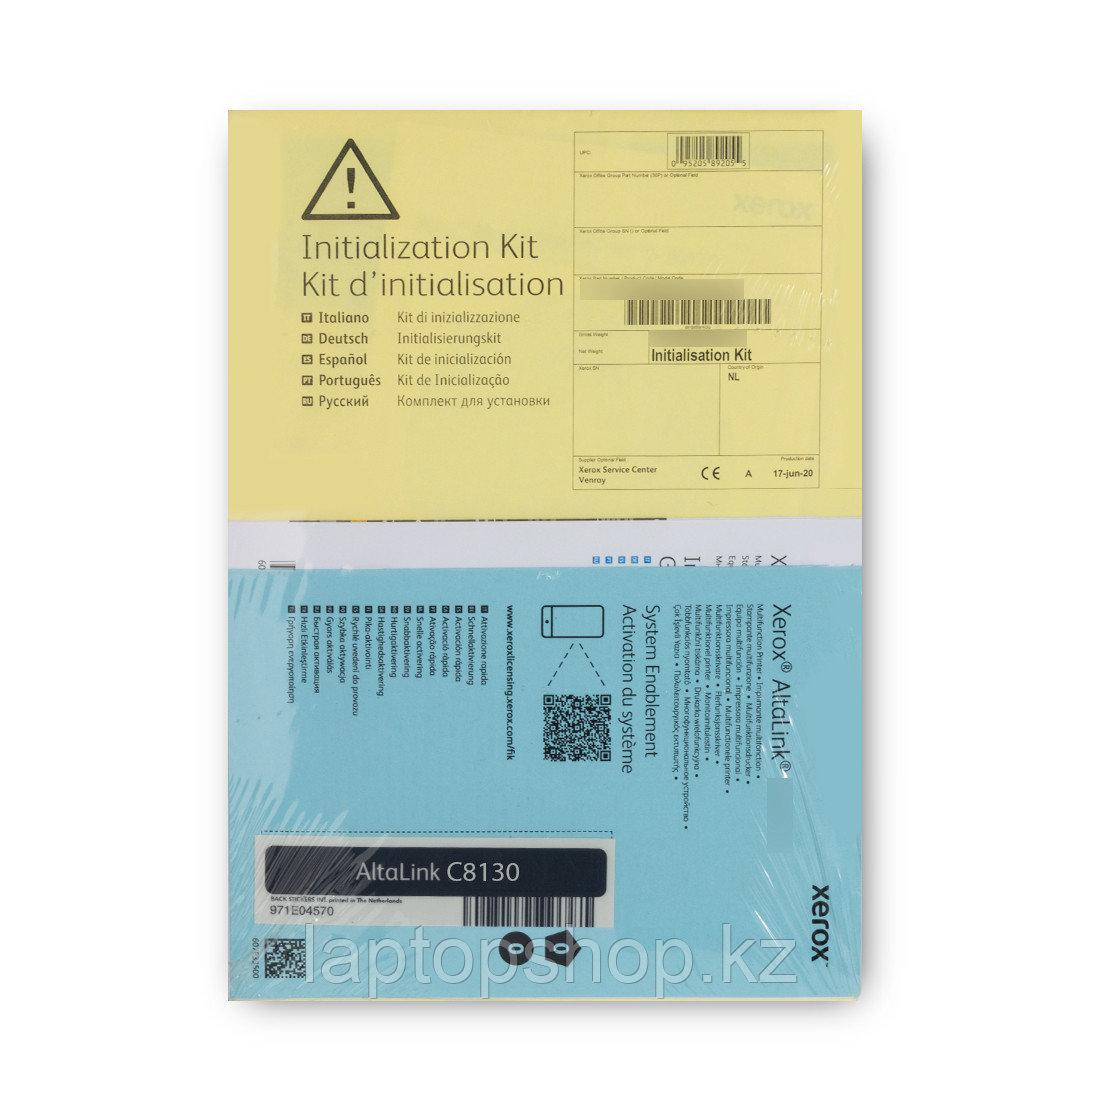 Комплект инициализации Xerox AltaLink C8130 (097S05042)